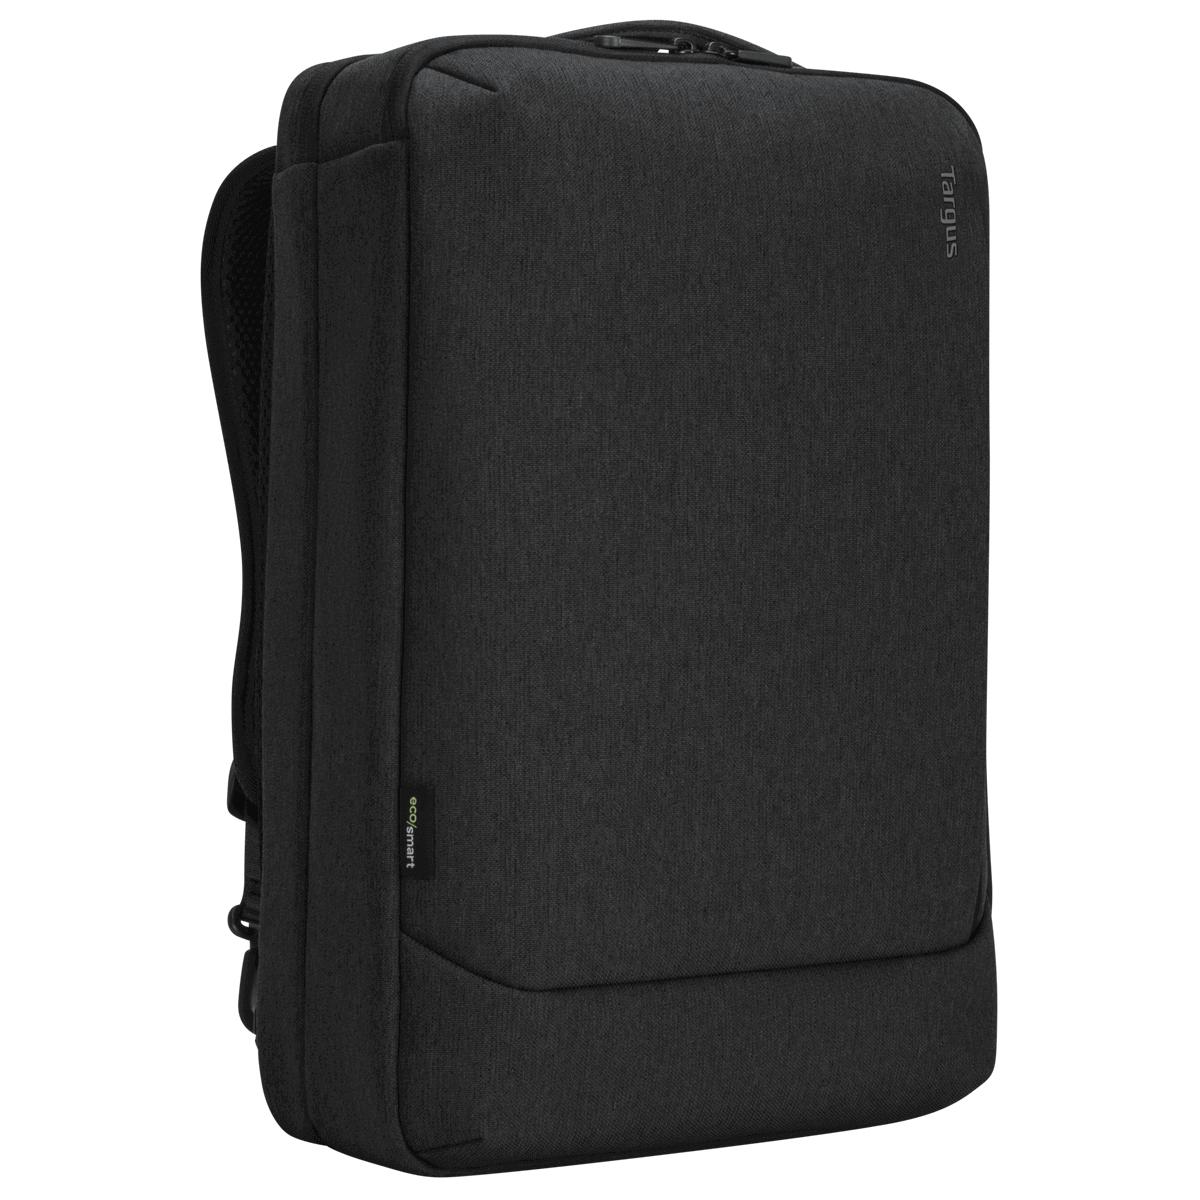 Targus Cypress notebook case 39.6 cm 15.6